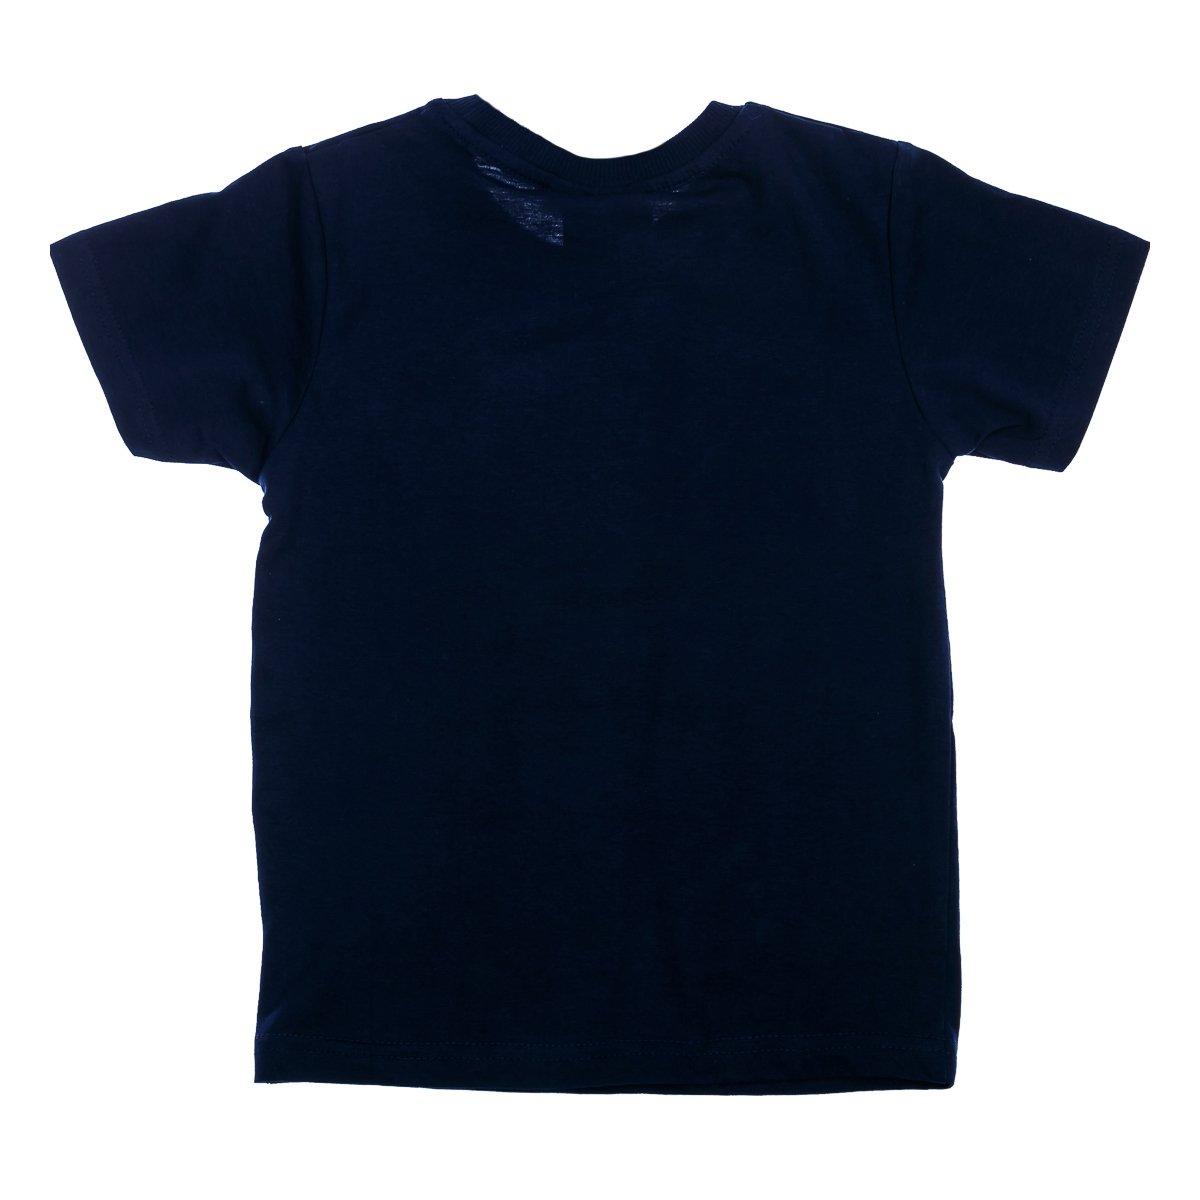 Купить Футболки, майки, топы, туники, Футболка E Plus M Batman Blue, р. 134 BAT5202184 ТМ: E Plus M, синий